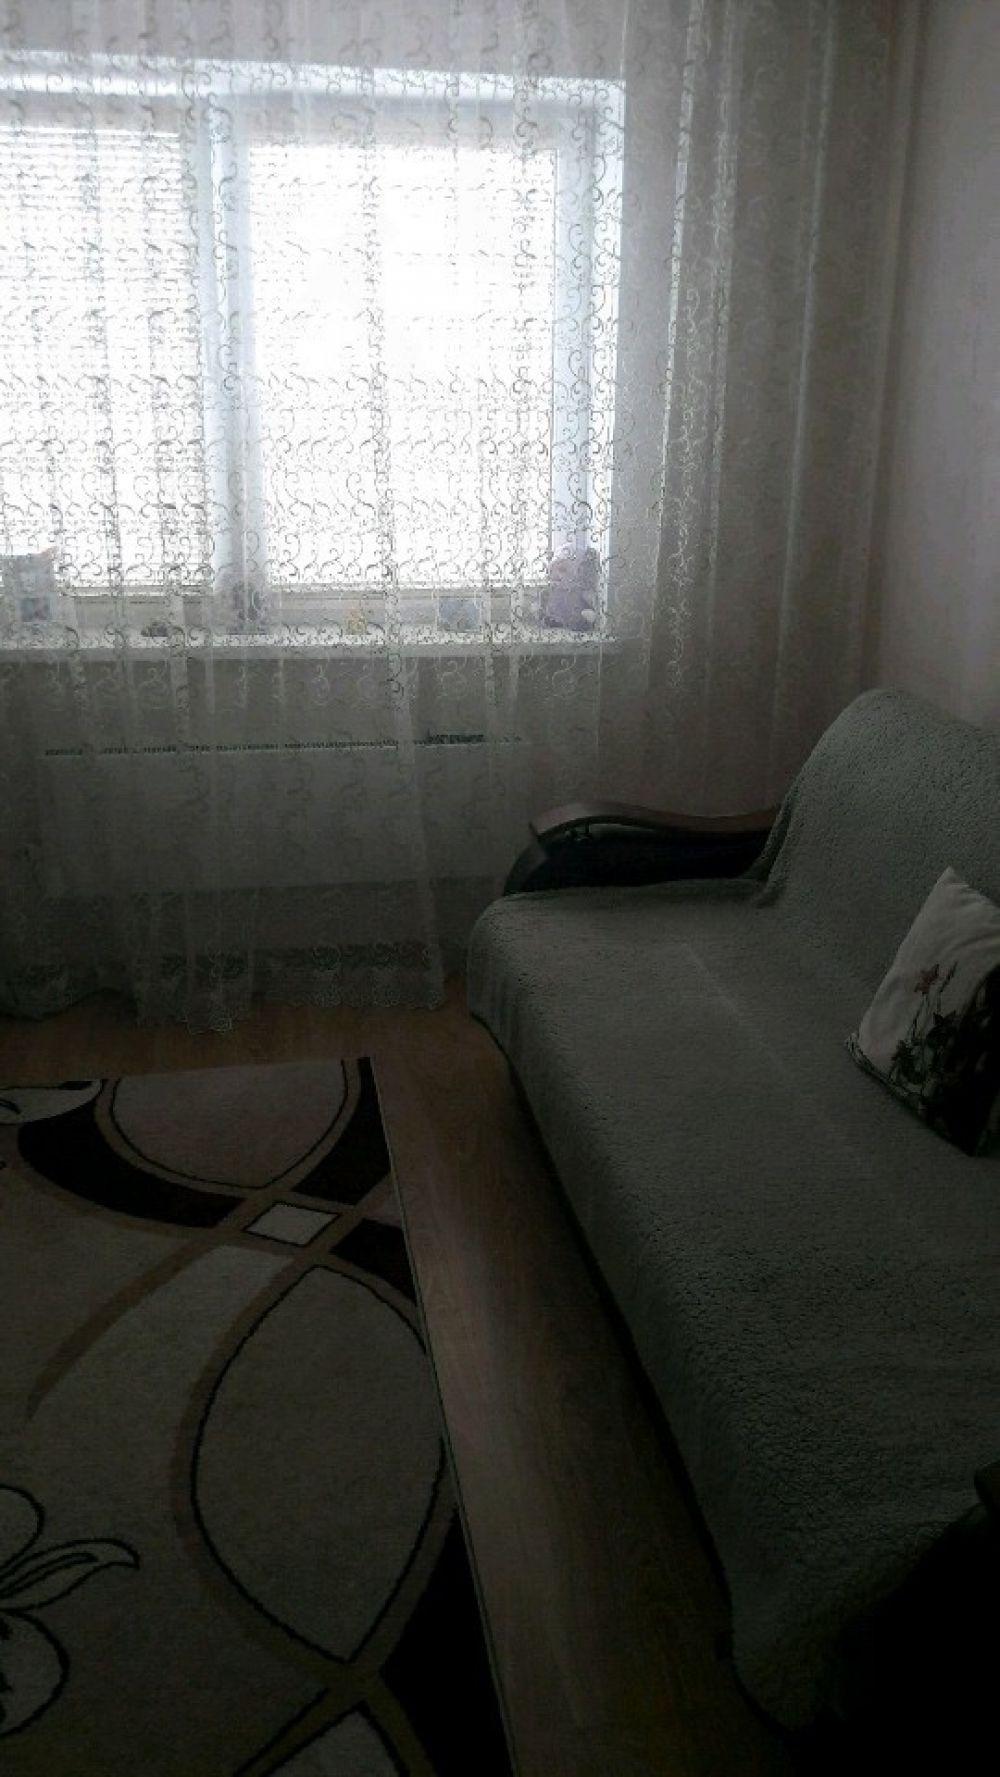 1-к квартира, 41 м2, 7/17 эт. Щёлково, Фряновское шоссе, фото 10